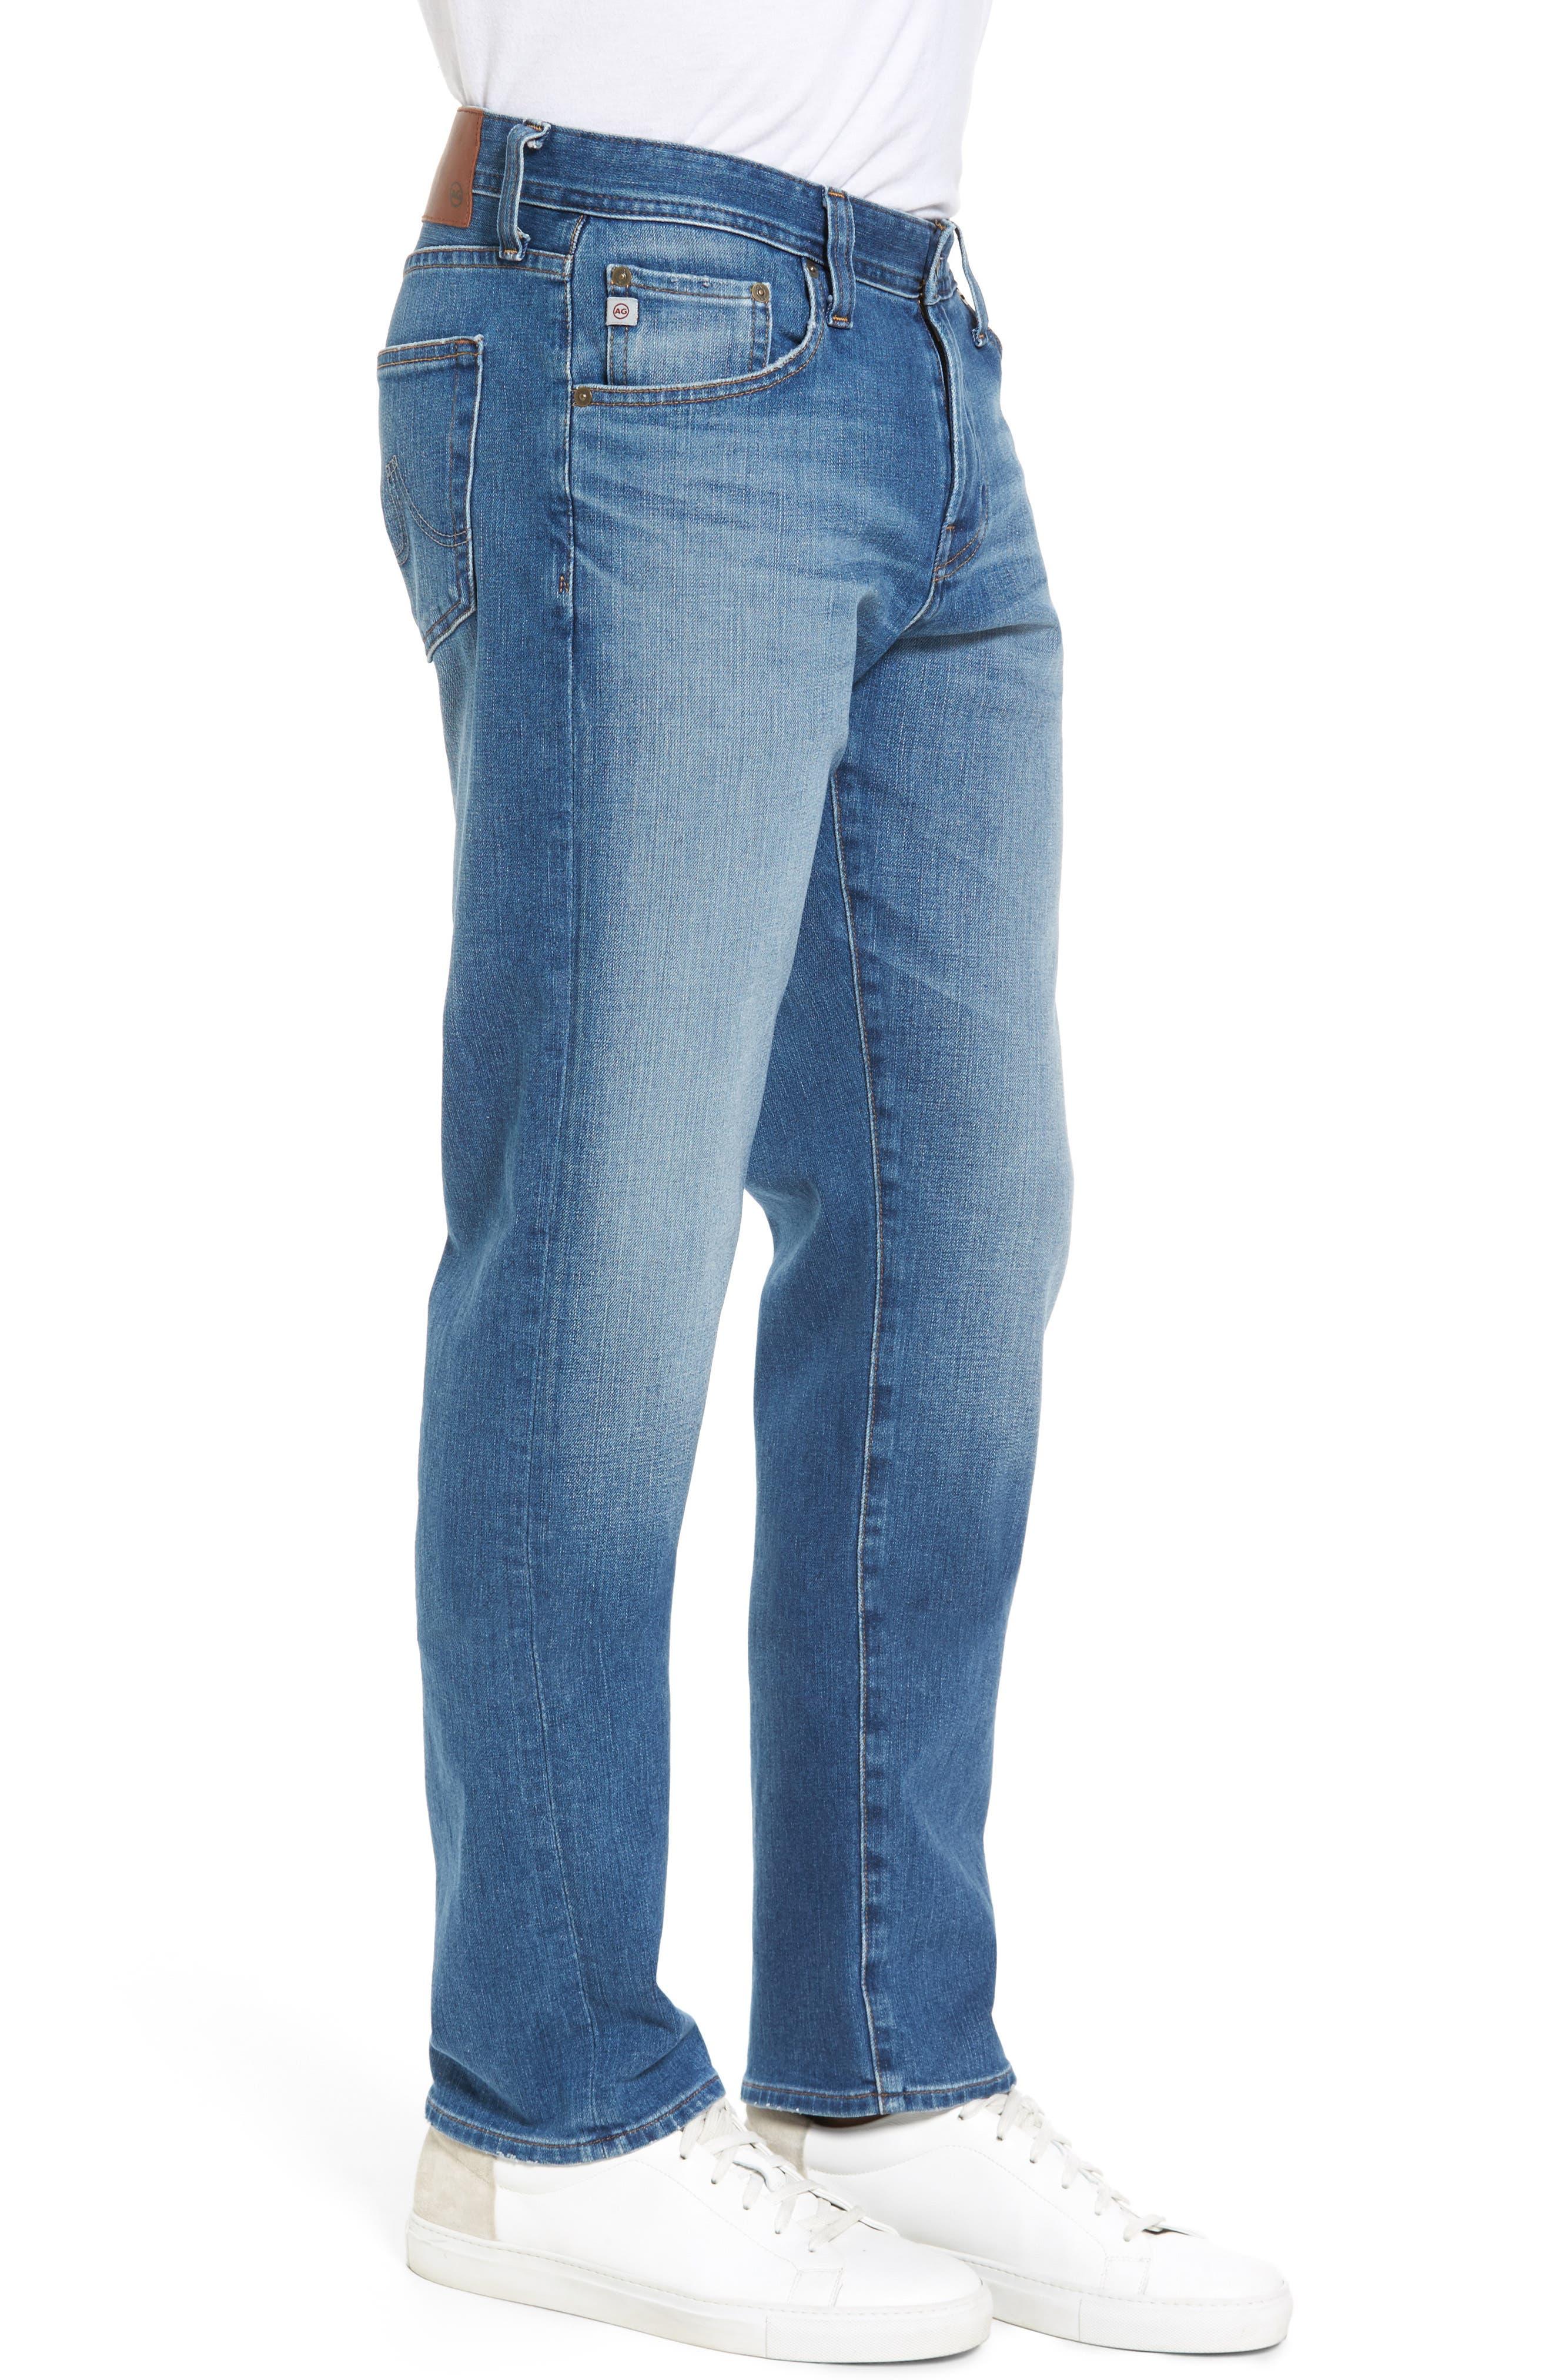 Graduate Slim Straight Fit Jeans,                             Alternate thumbnail 3, color,                             456